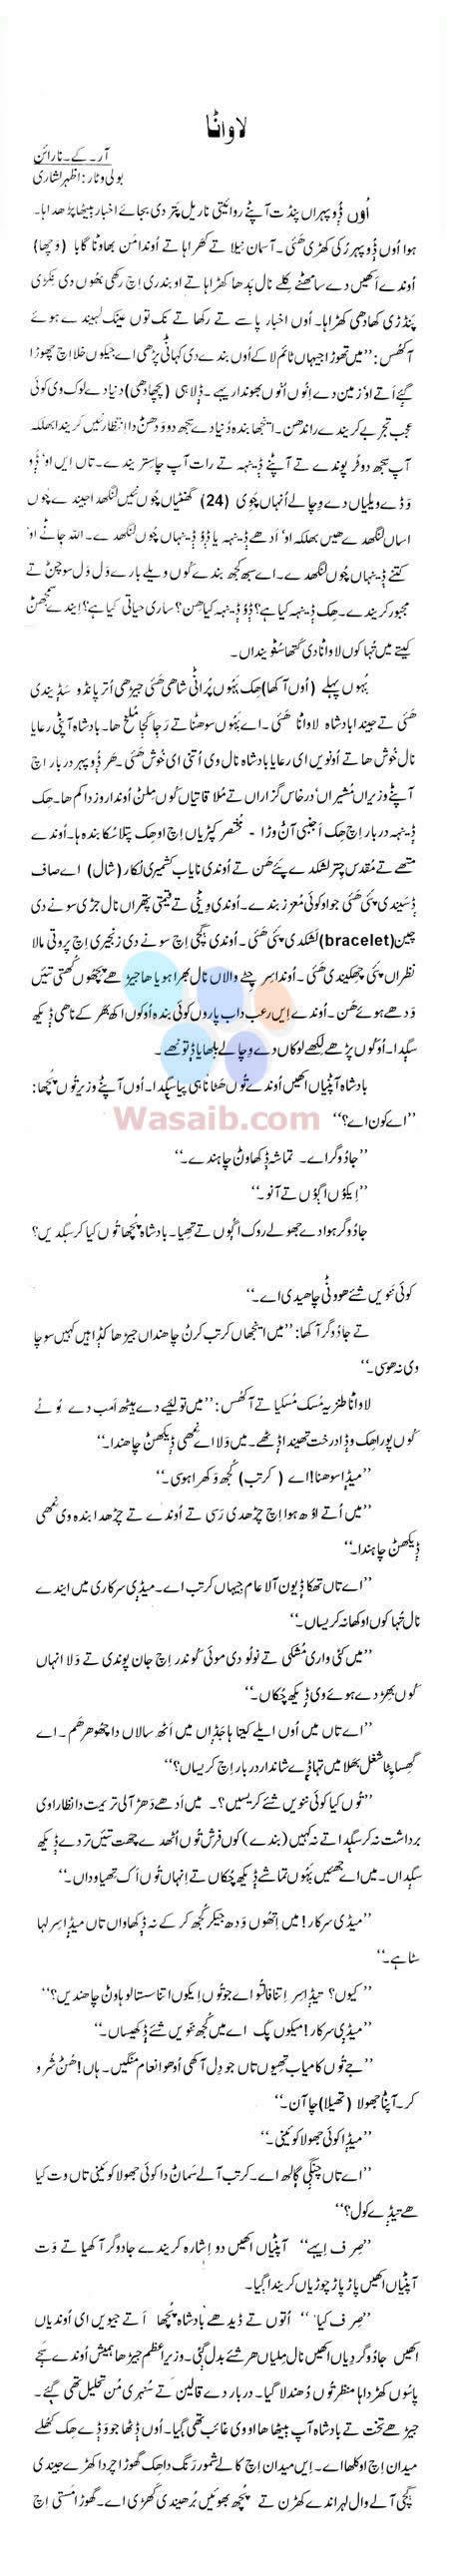 Seraiki Afsana Lawanra (R.K.Narian translator Azhar Lashari) Part-1